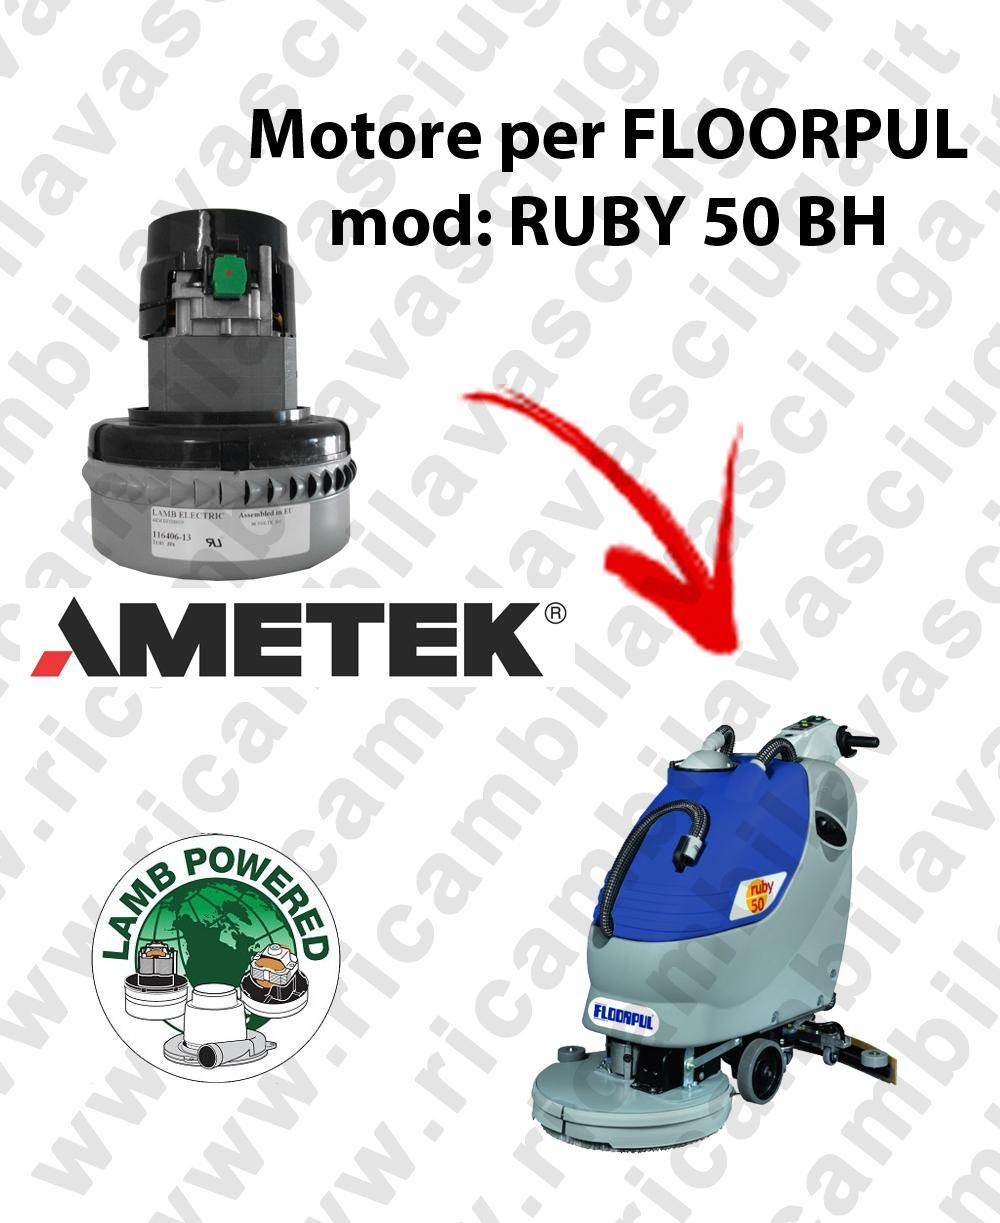 RUBY 50 BH Saugmotor LAMB AMETEK für scheuersaugmaschinen FLOORPUL